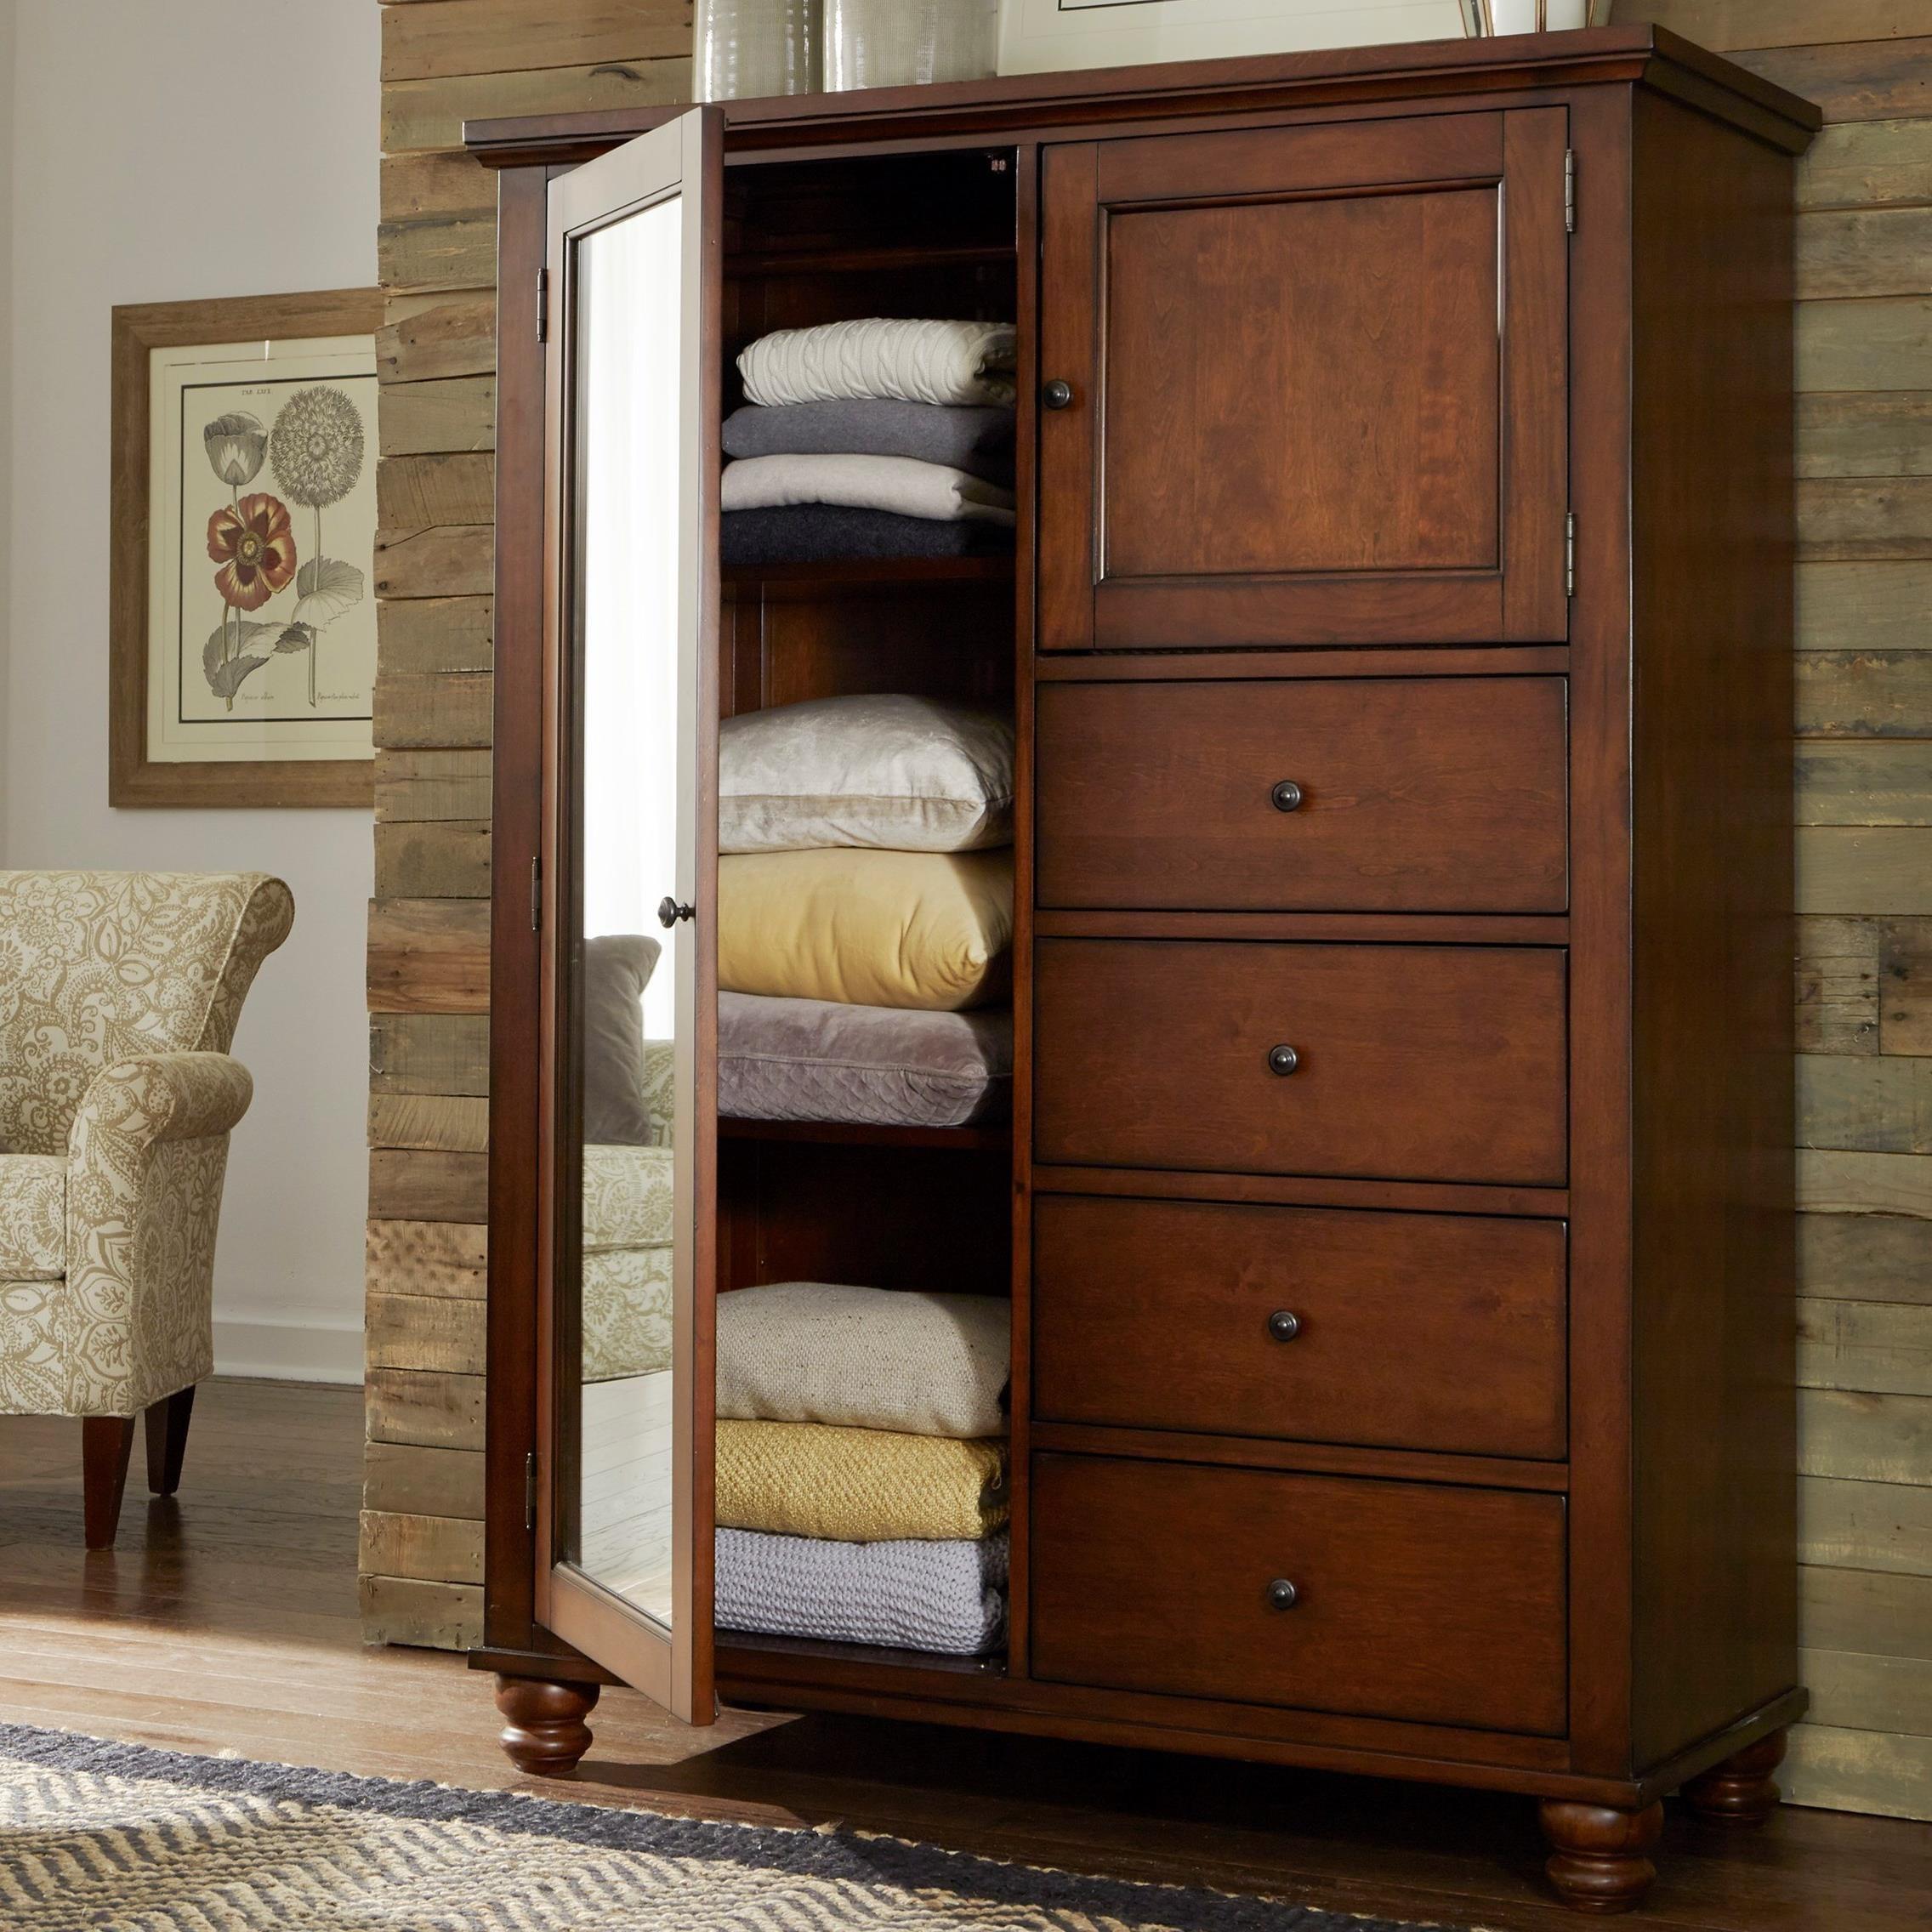 Cambridge 4 drawer 2 Door Chiffarobe  by Aspenhome at Mueller Furniture